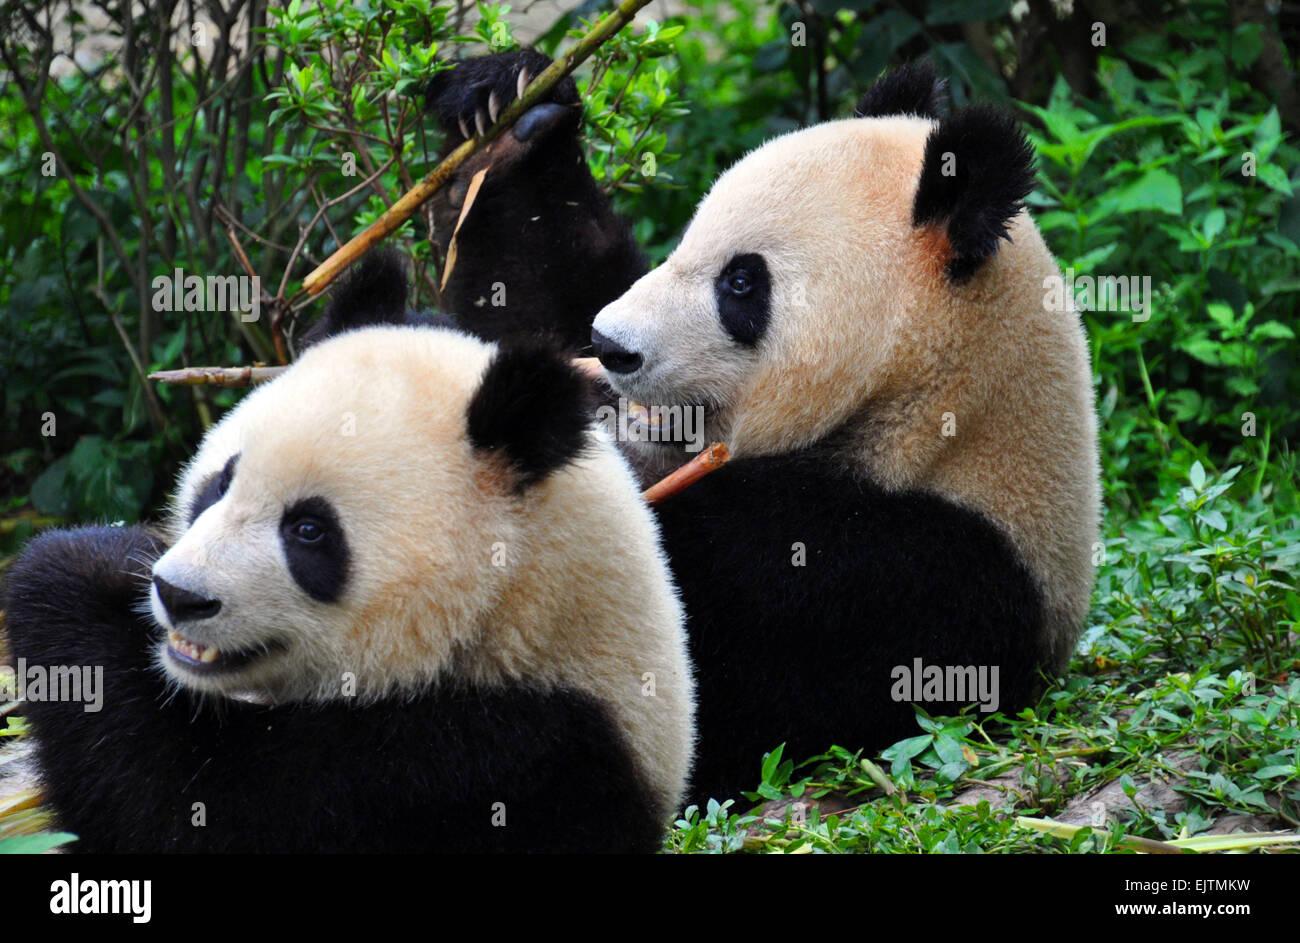 A pair of Giant Pandas enjoying bamboo at the National Panda Reserve at Chengdu, ( The capital of Sichuan )China Stock Photo